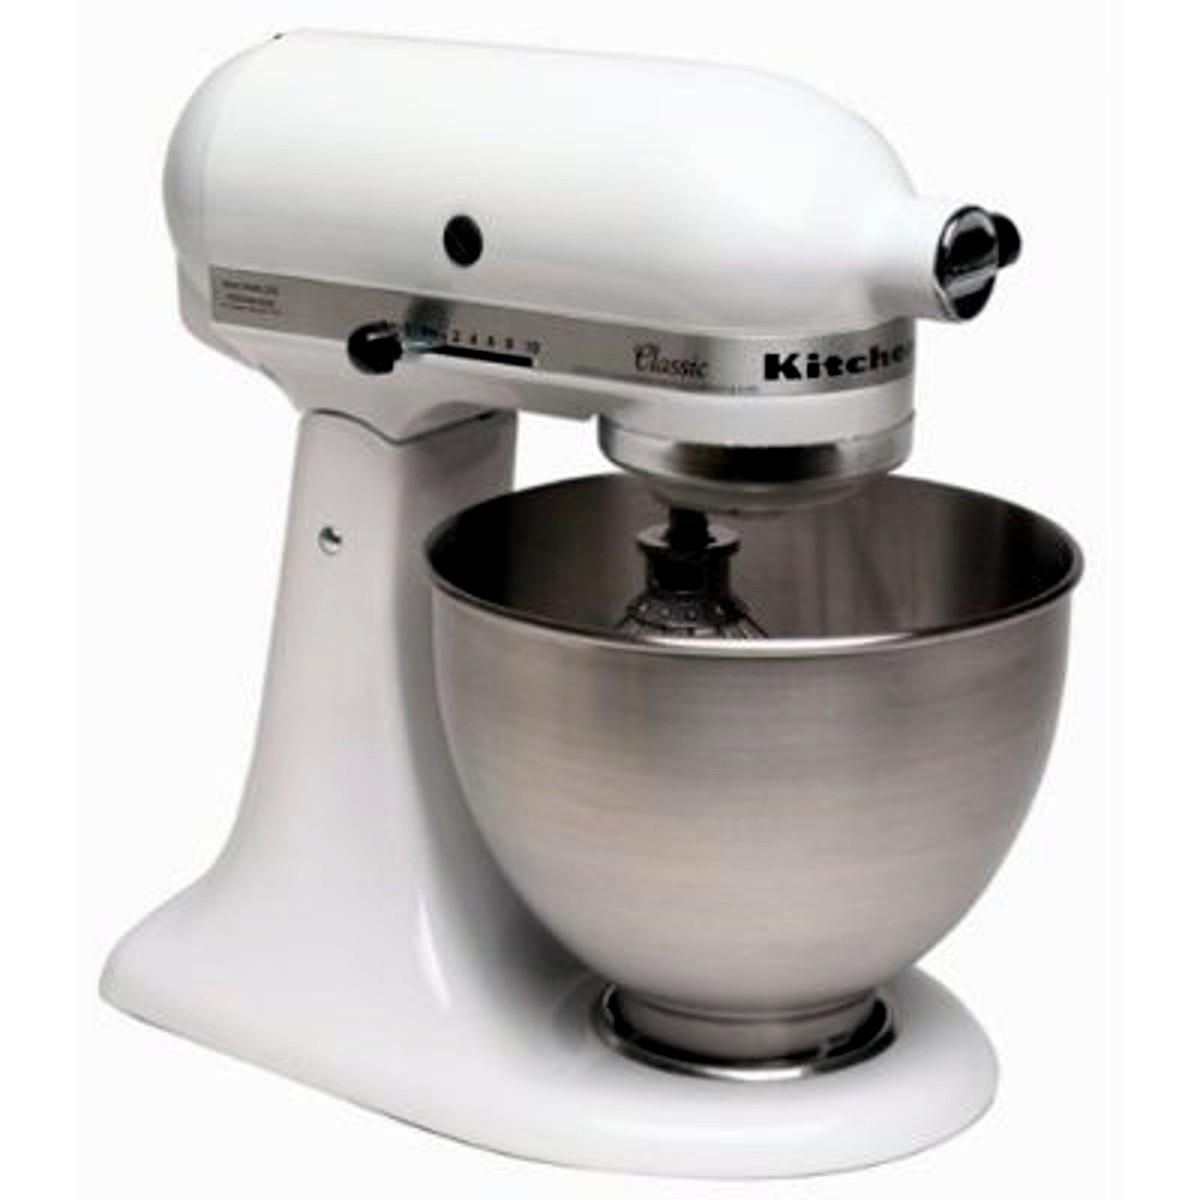 Kitchenaid K45ss Classic 4 1 2 Quart Stand Mixer Review